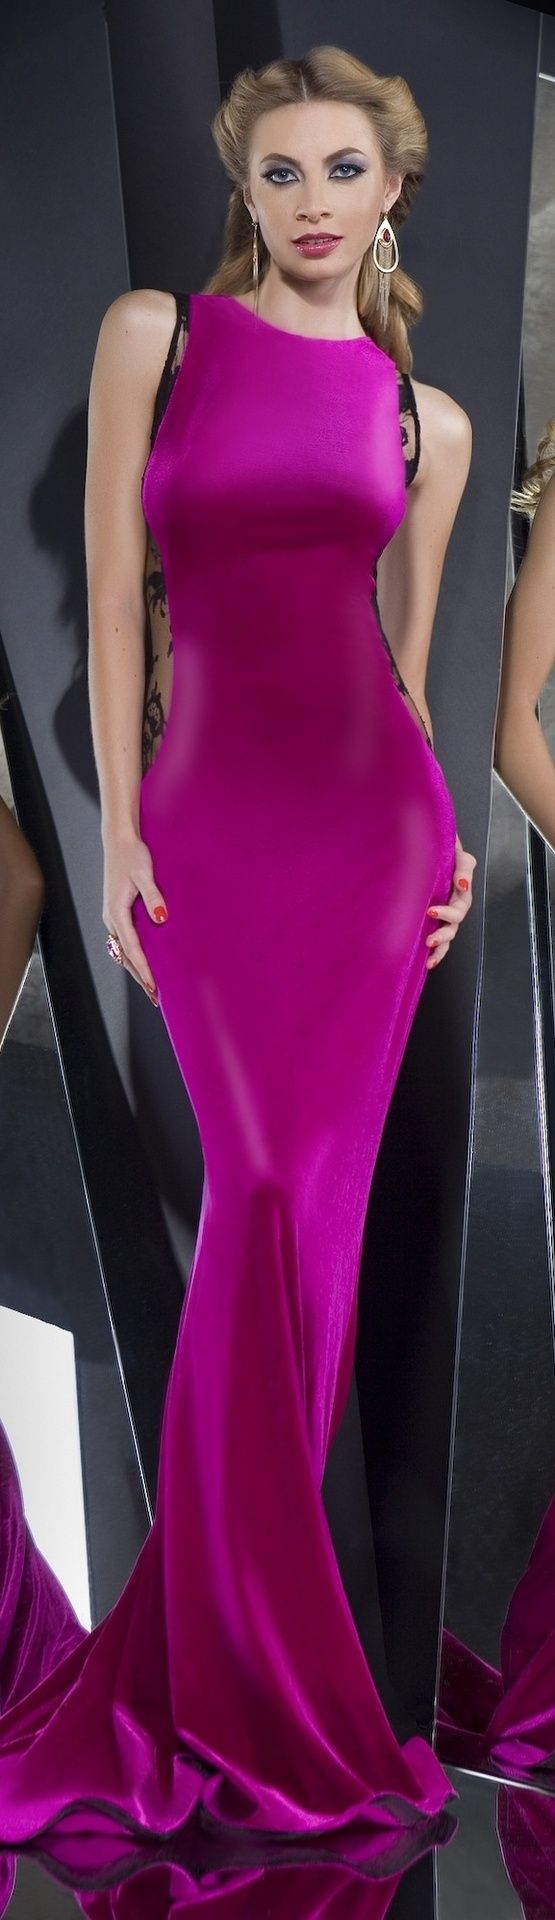 Mejores 216 imágenes de Dresses en Pinterest | Vestidos de noche ...